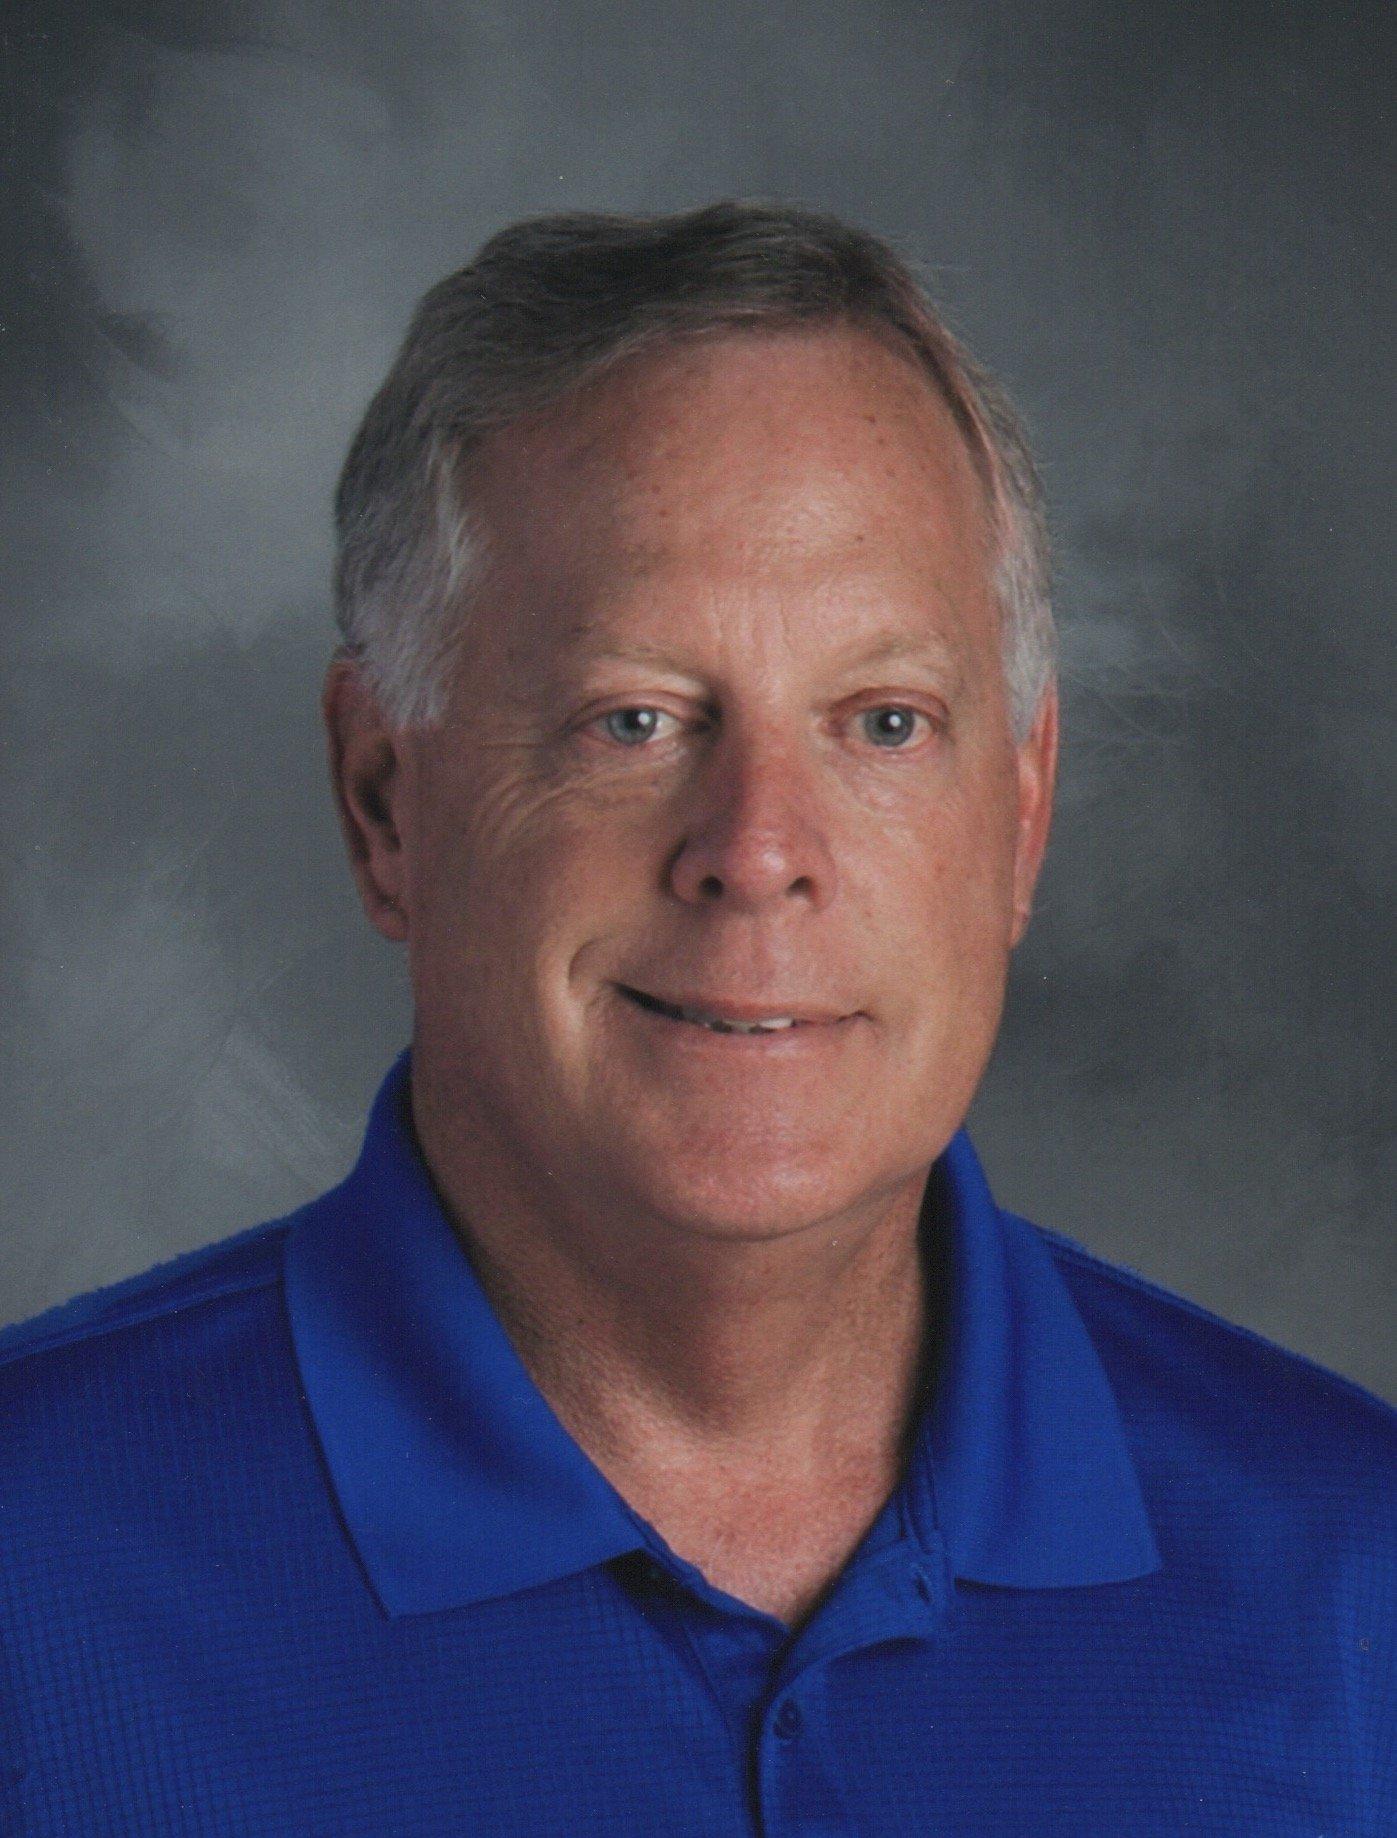 Coach Dave Holt